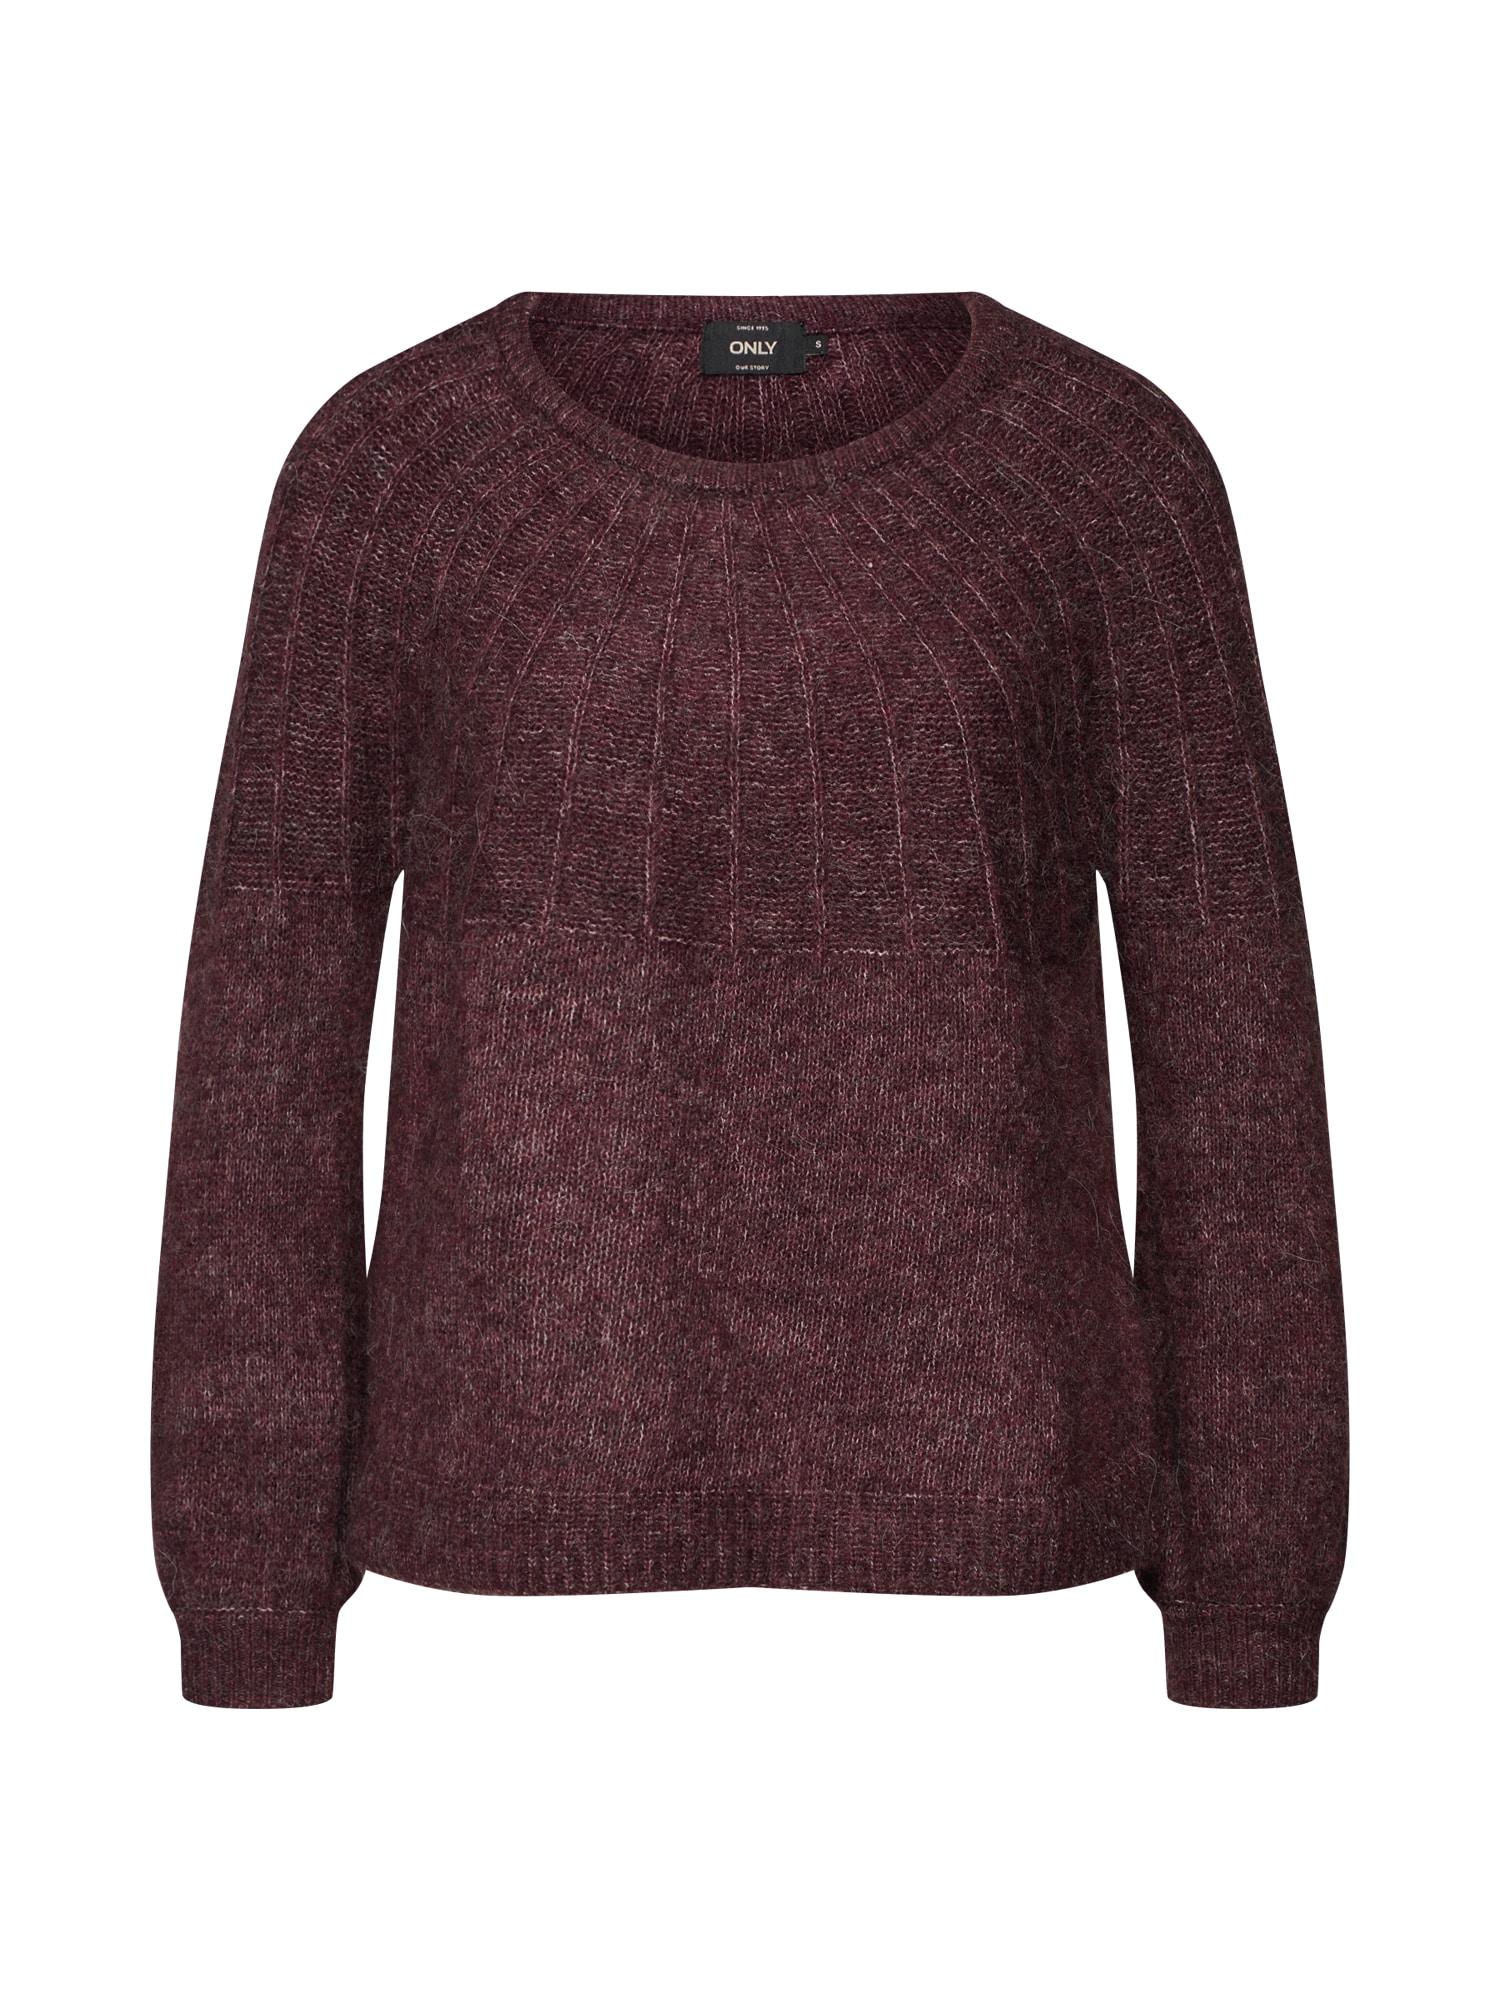 ONLY Megztinis vyšninė spalva